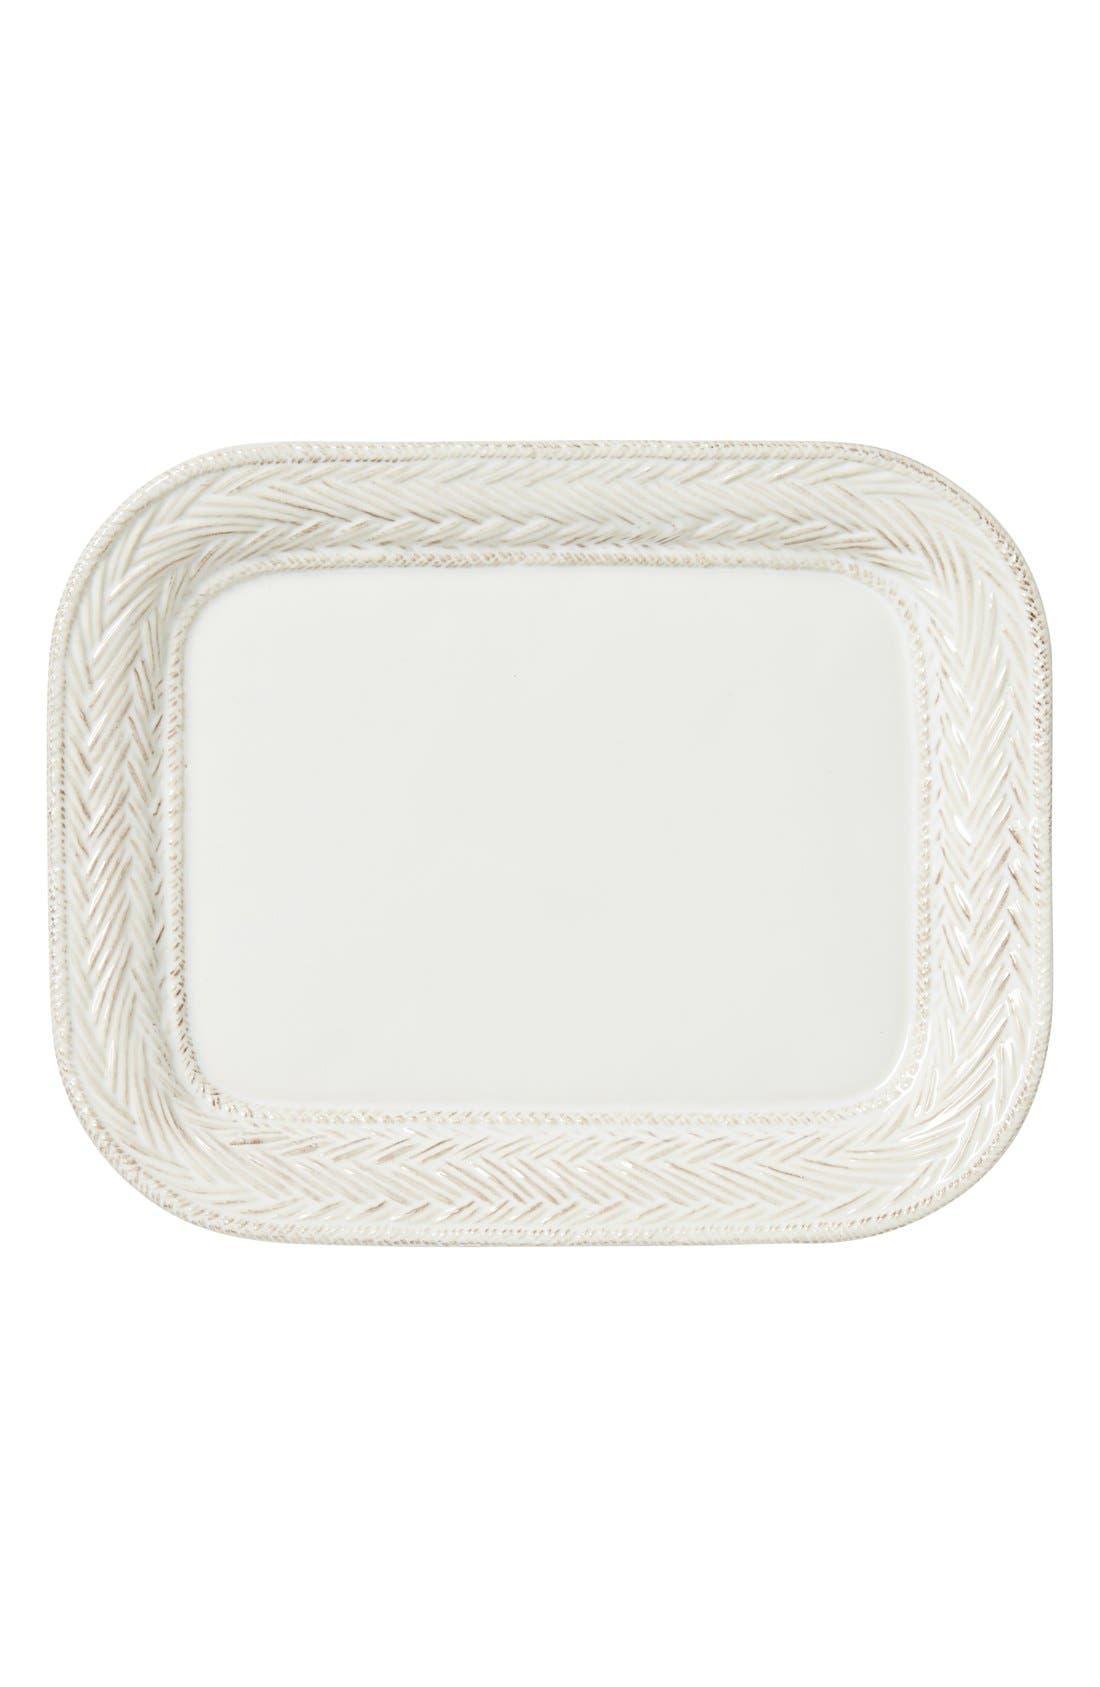 Alternate Image 1 Selected - Juliska Le Panier Medium Serving Platter